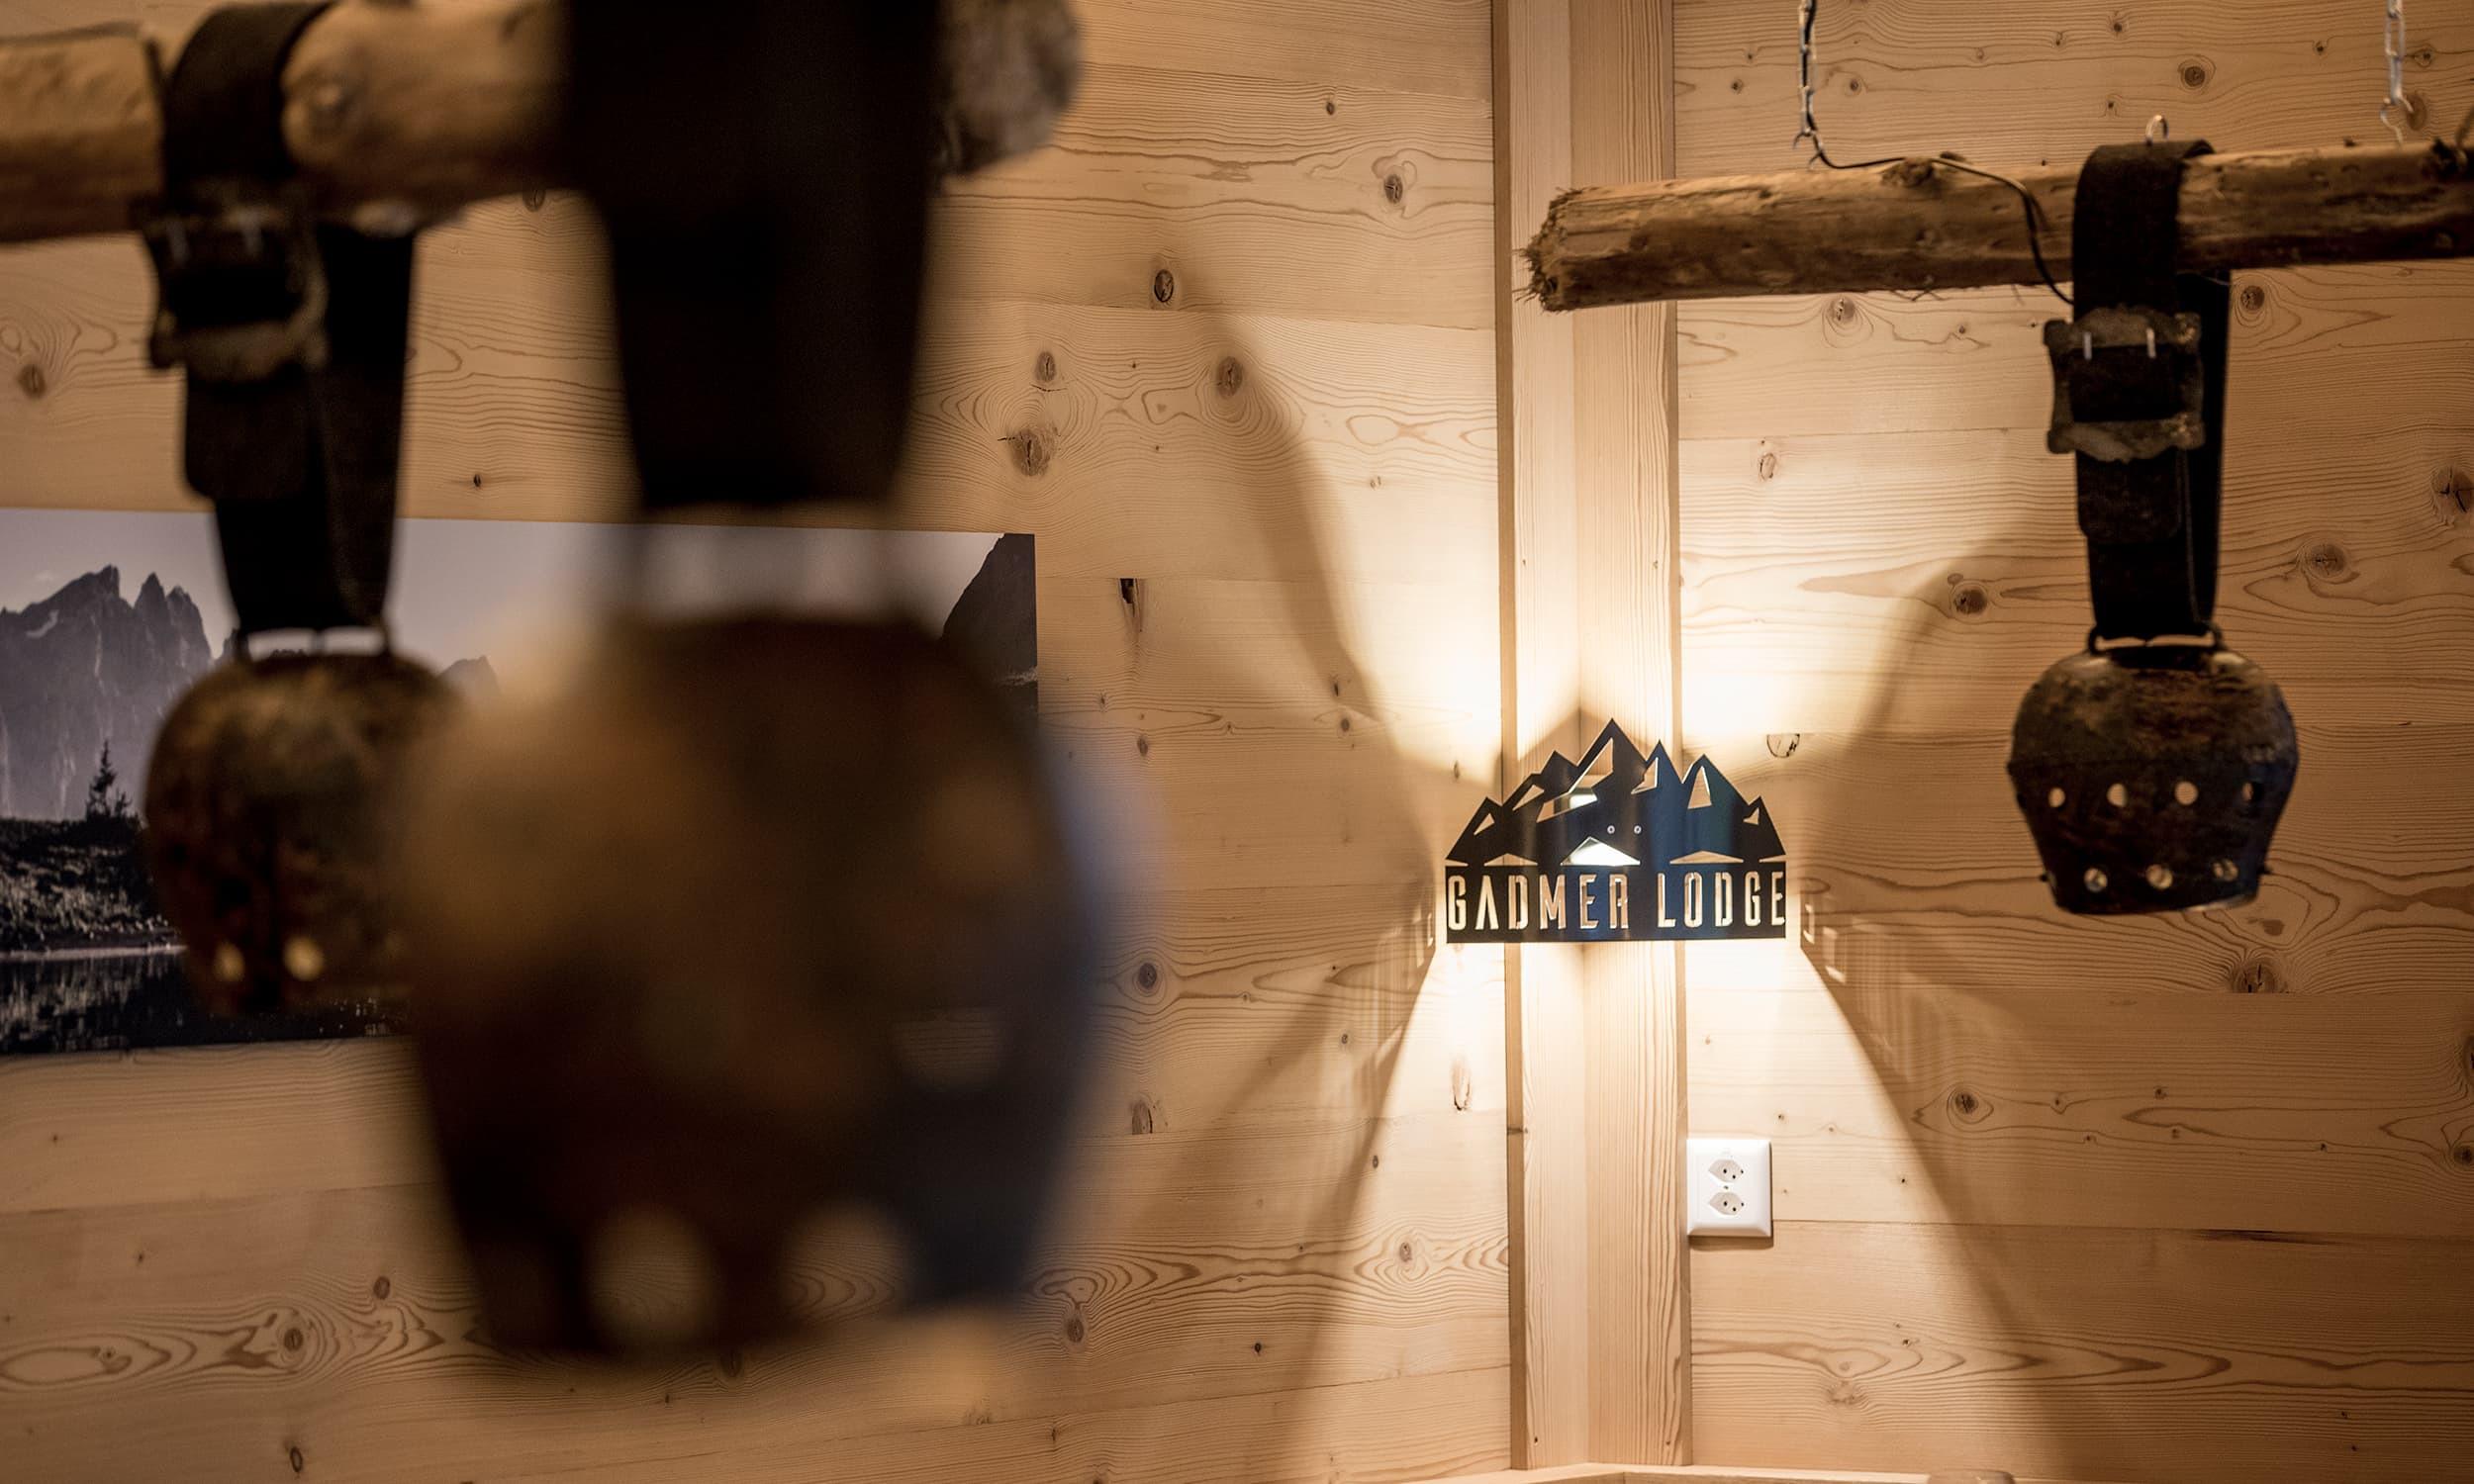 2019-gadmer-lodge-mood-lampe1